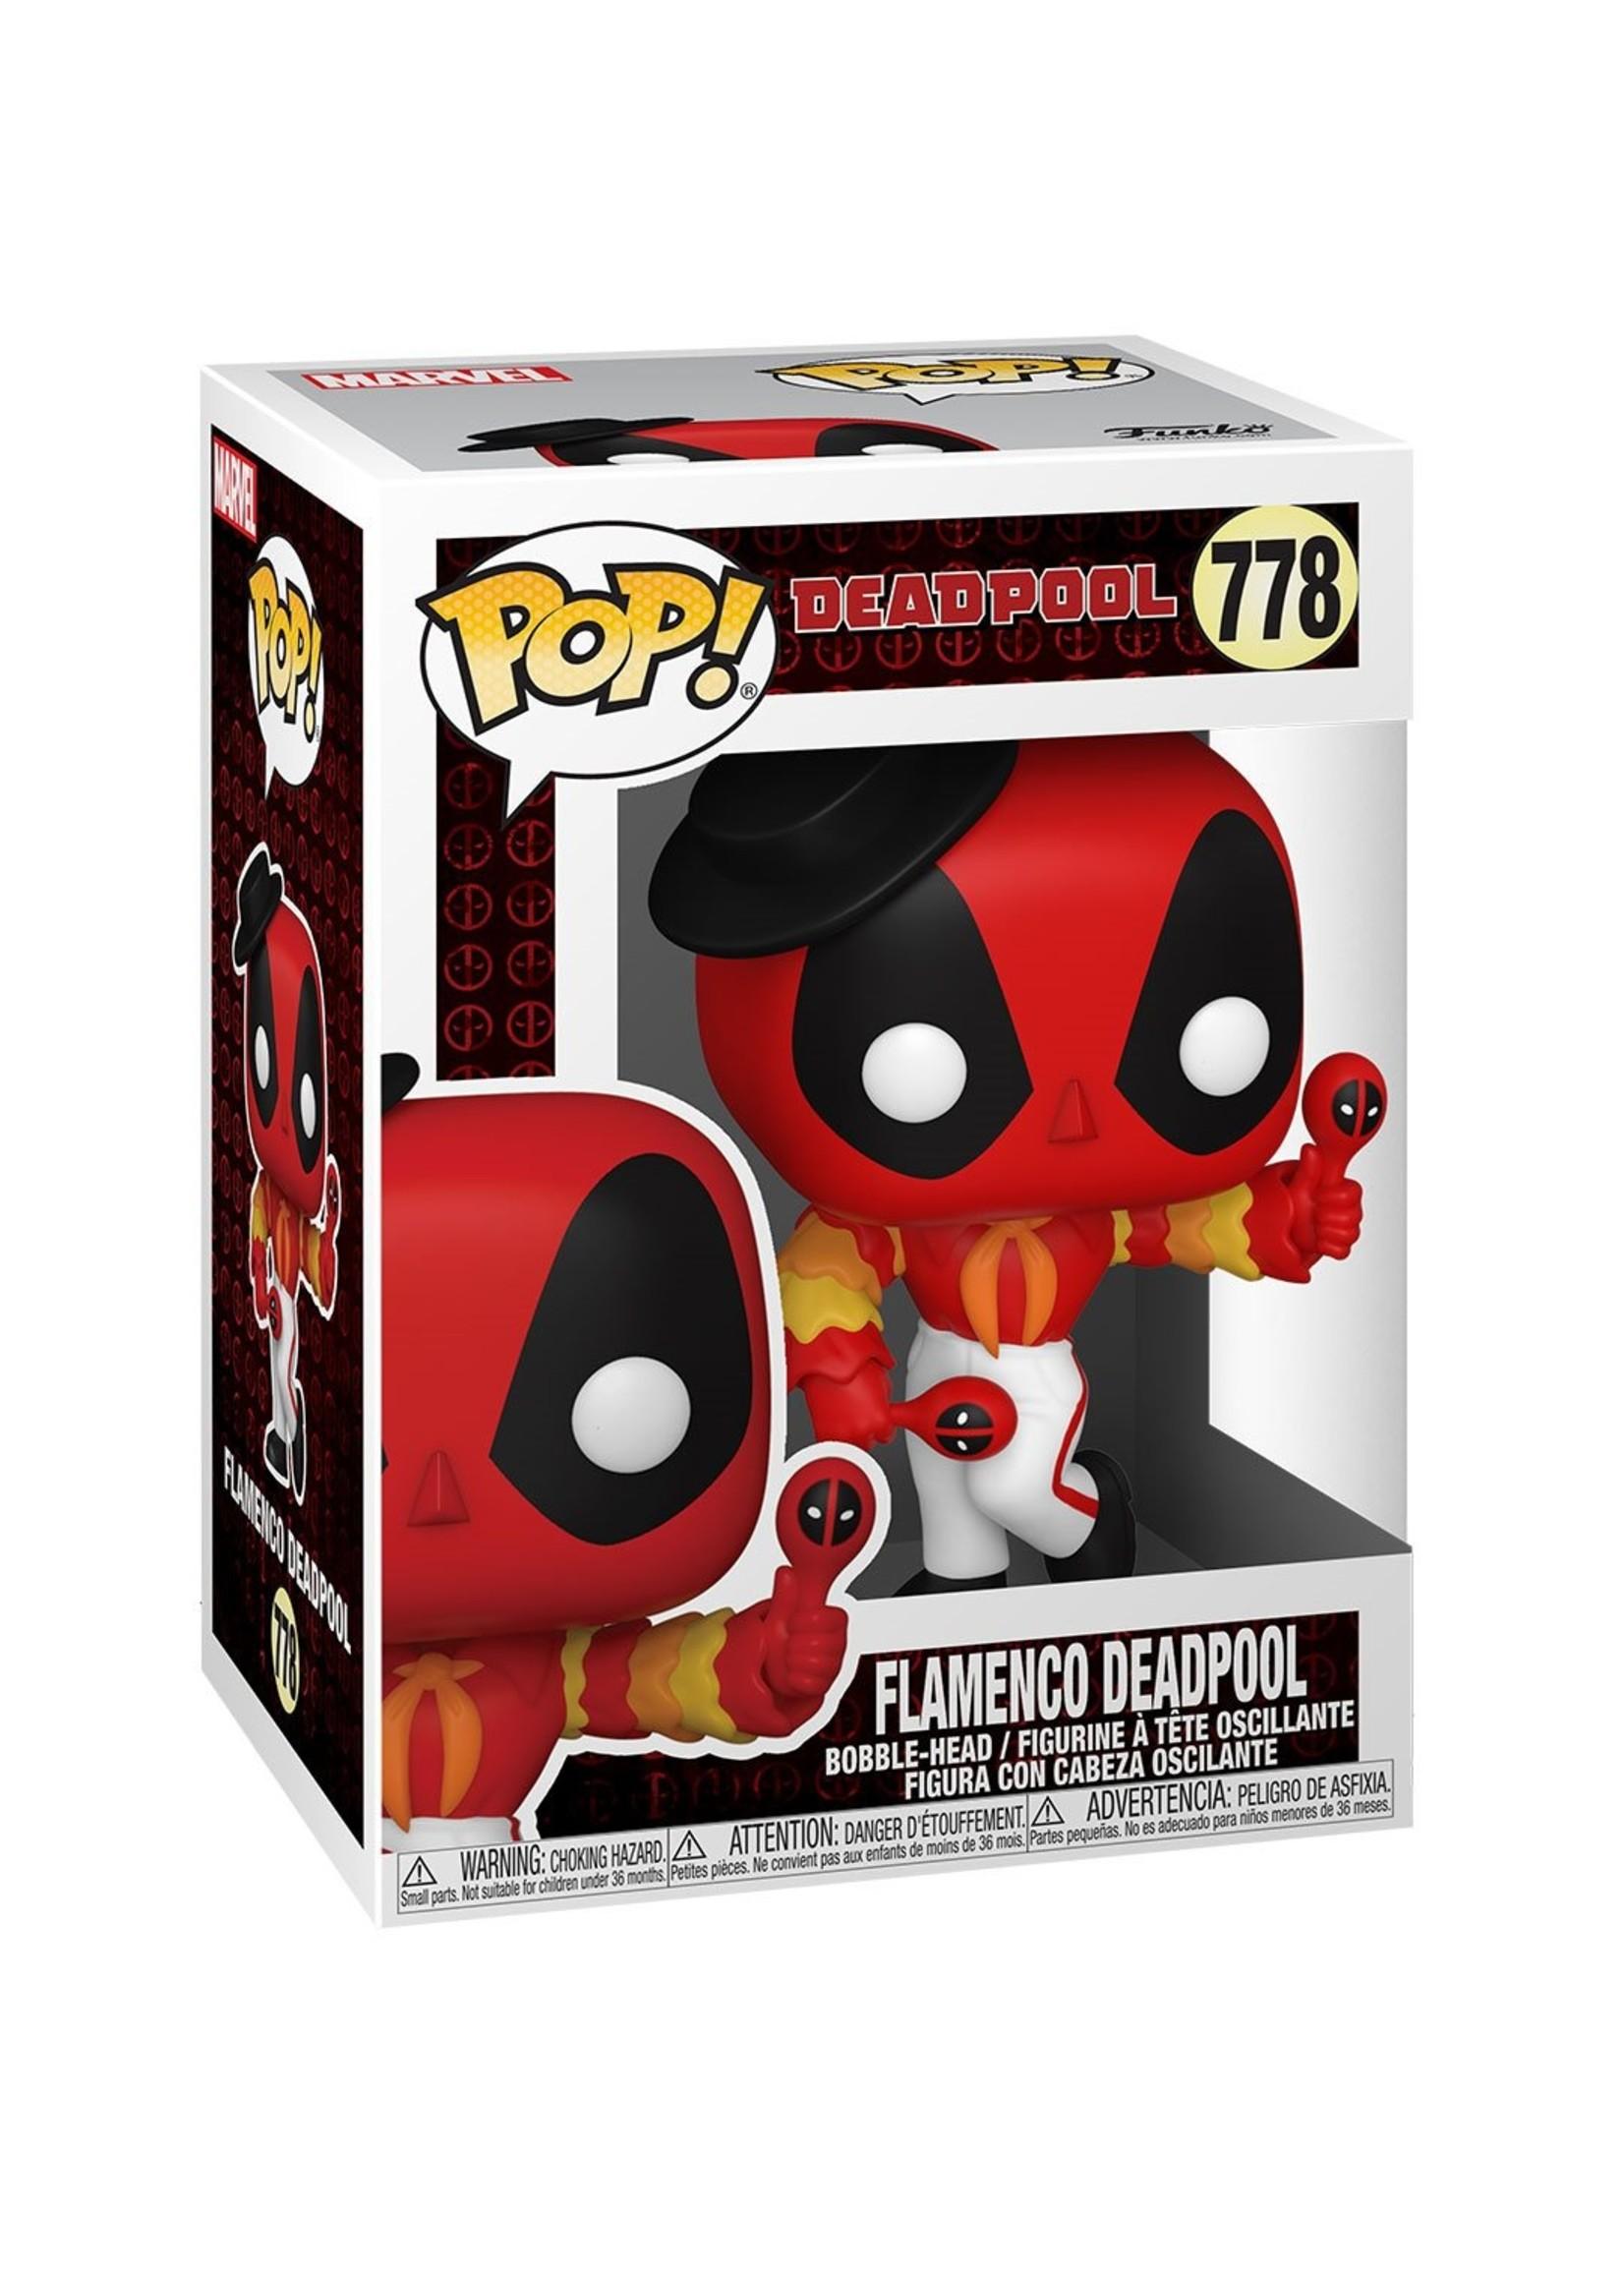 Flamenco Deadpool Pop